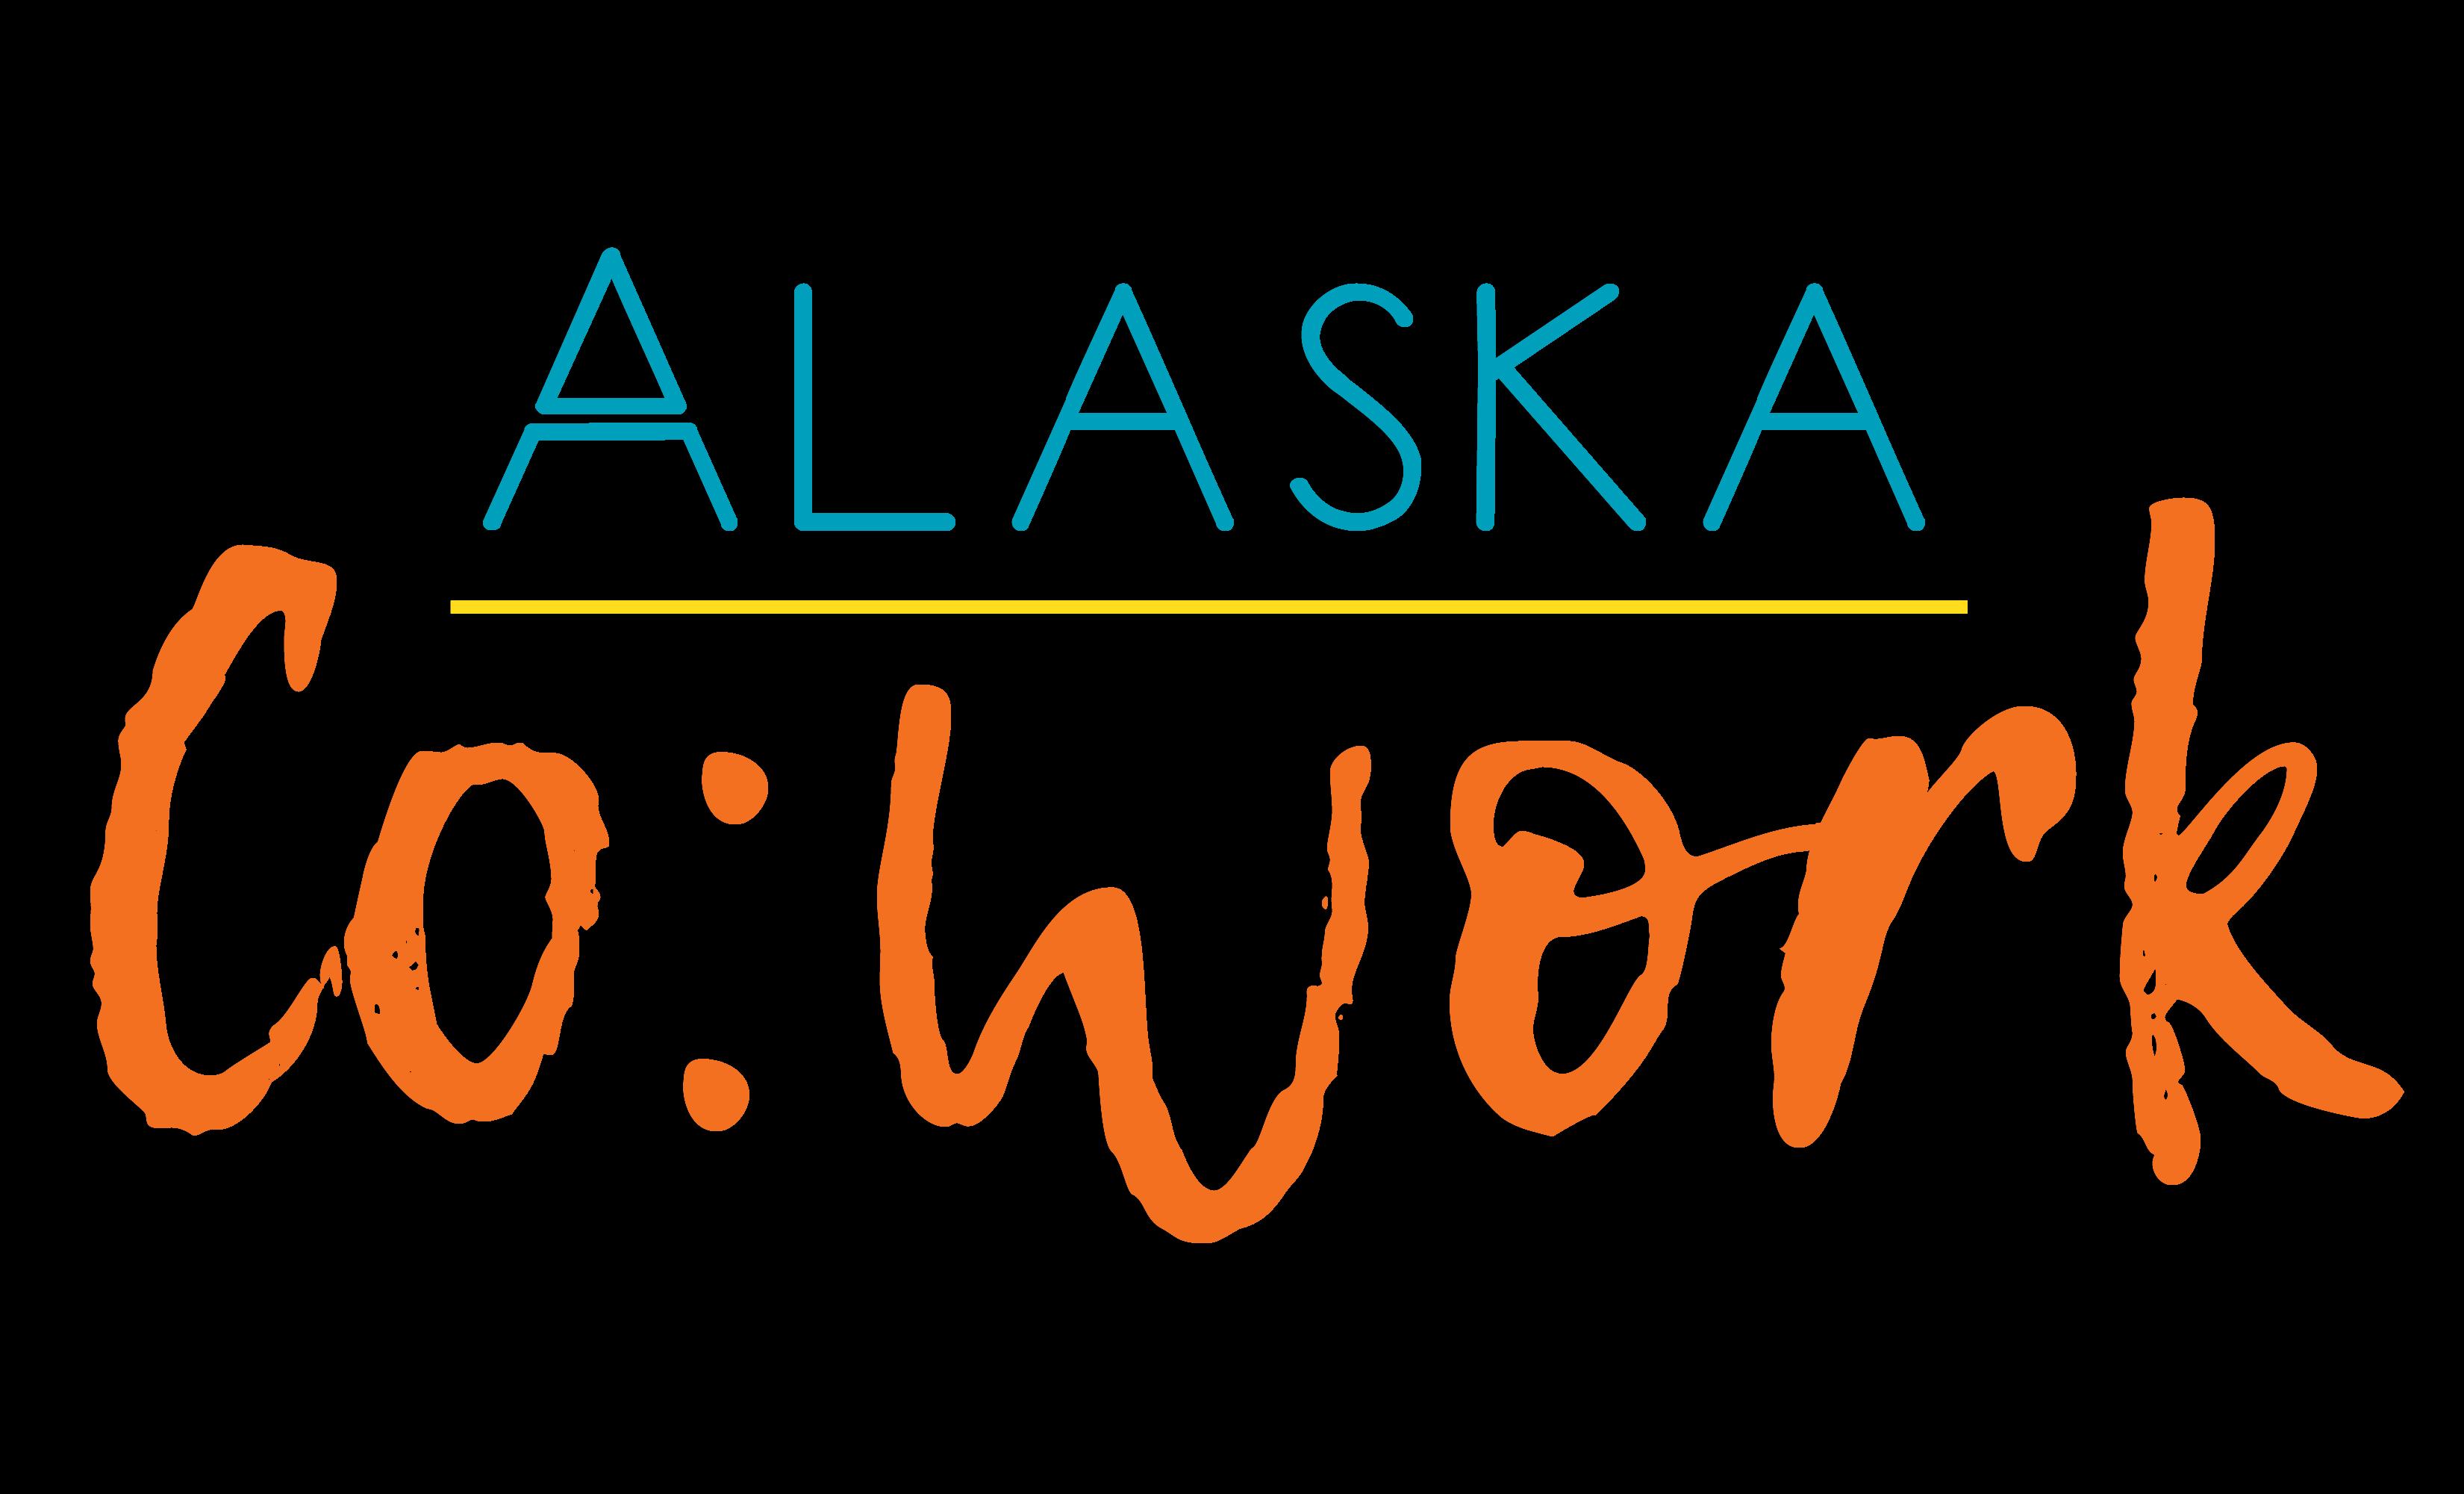 Alaska Co:Work